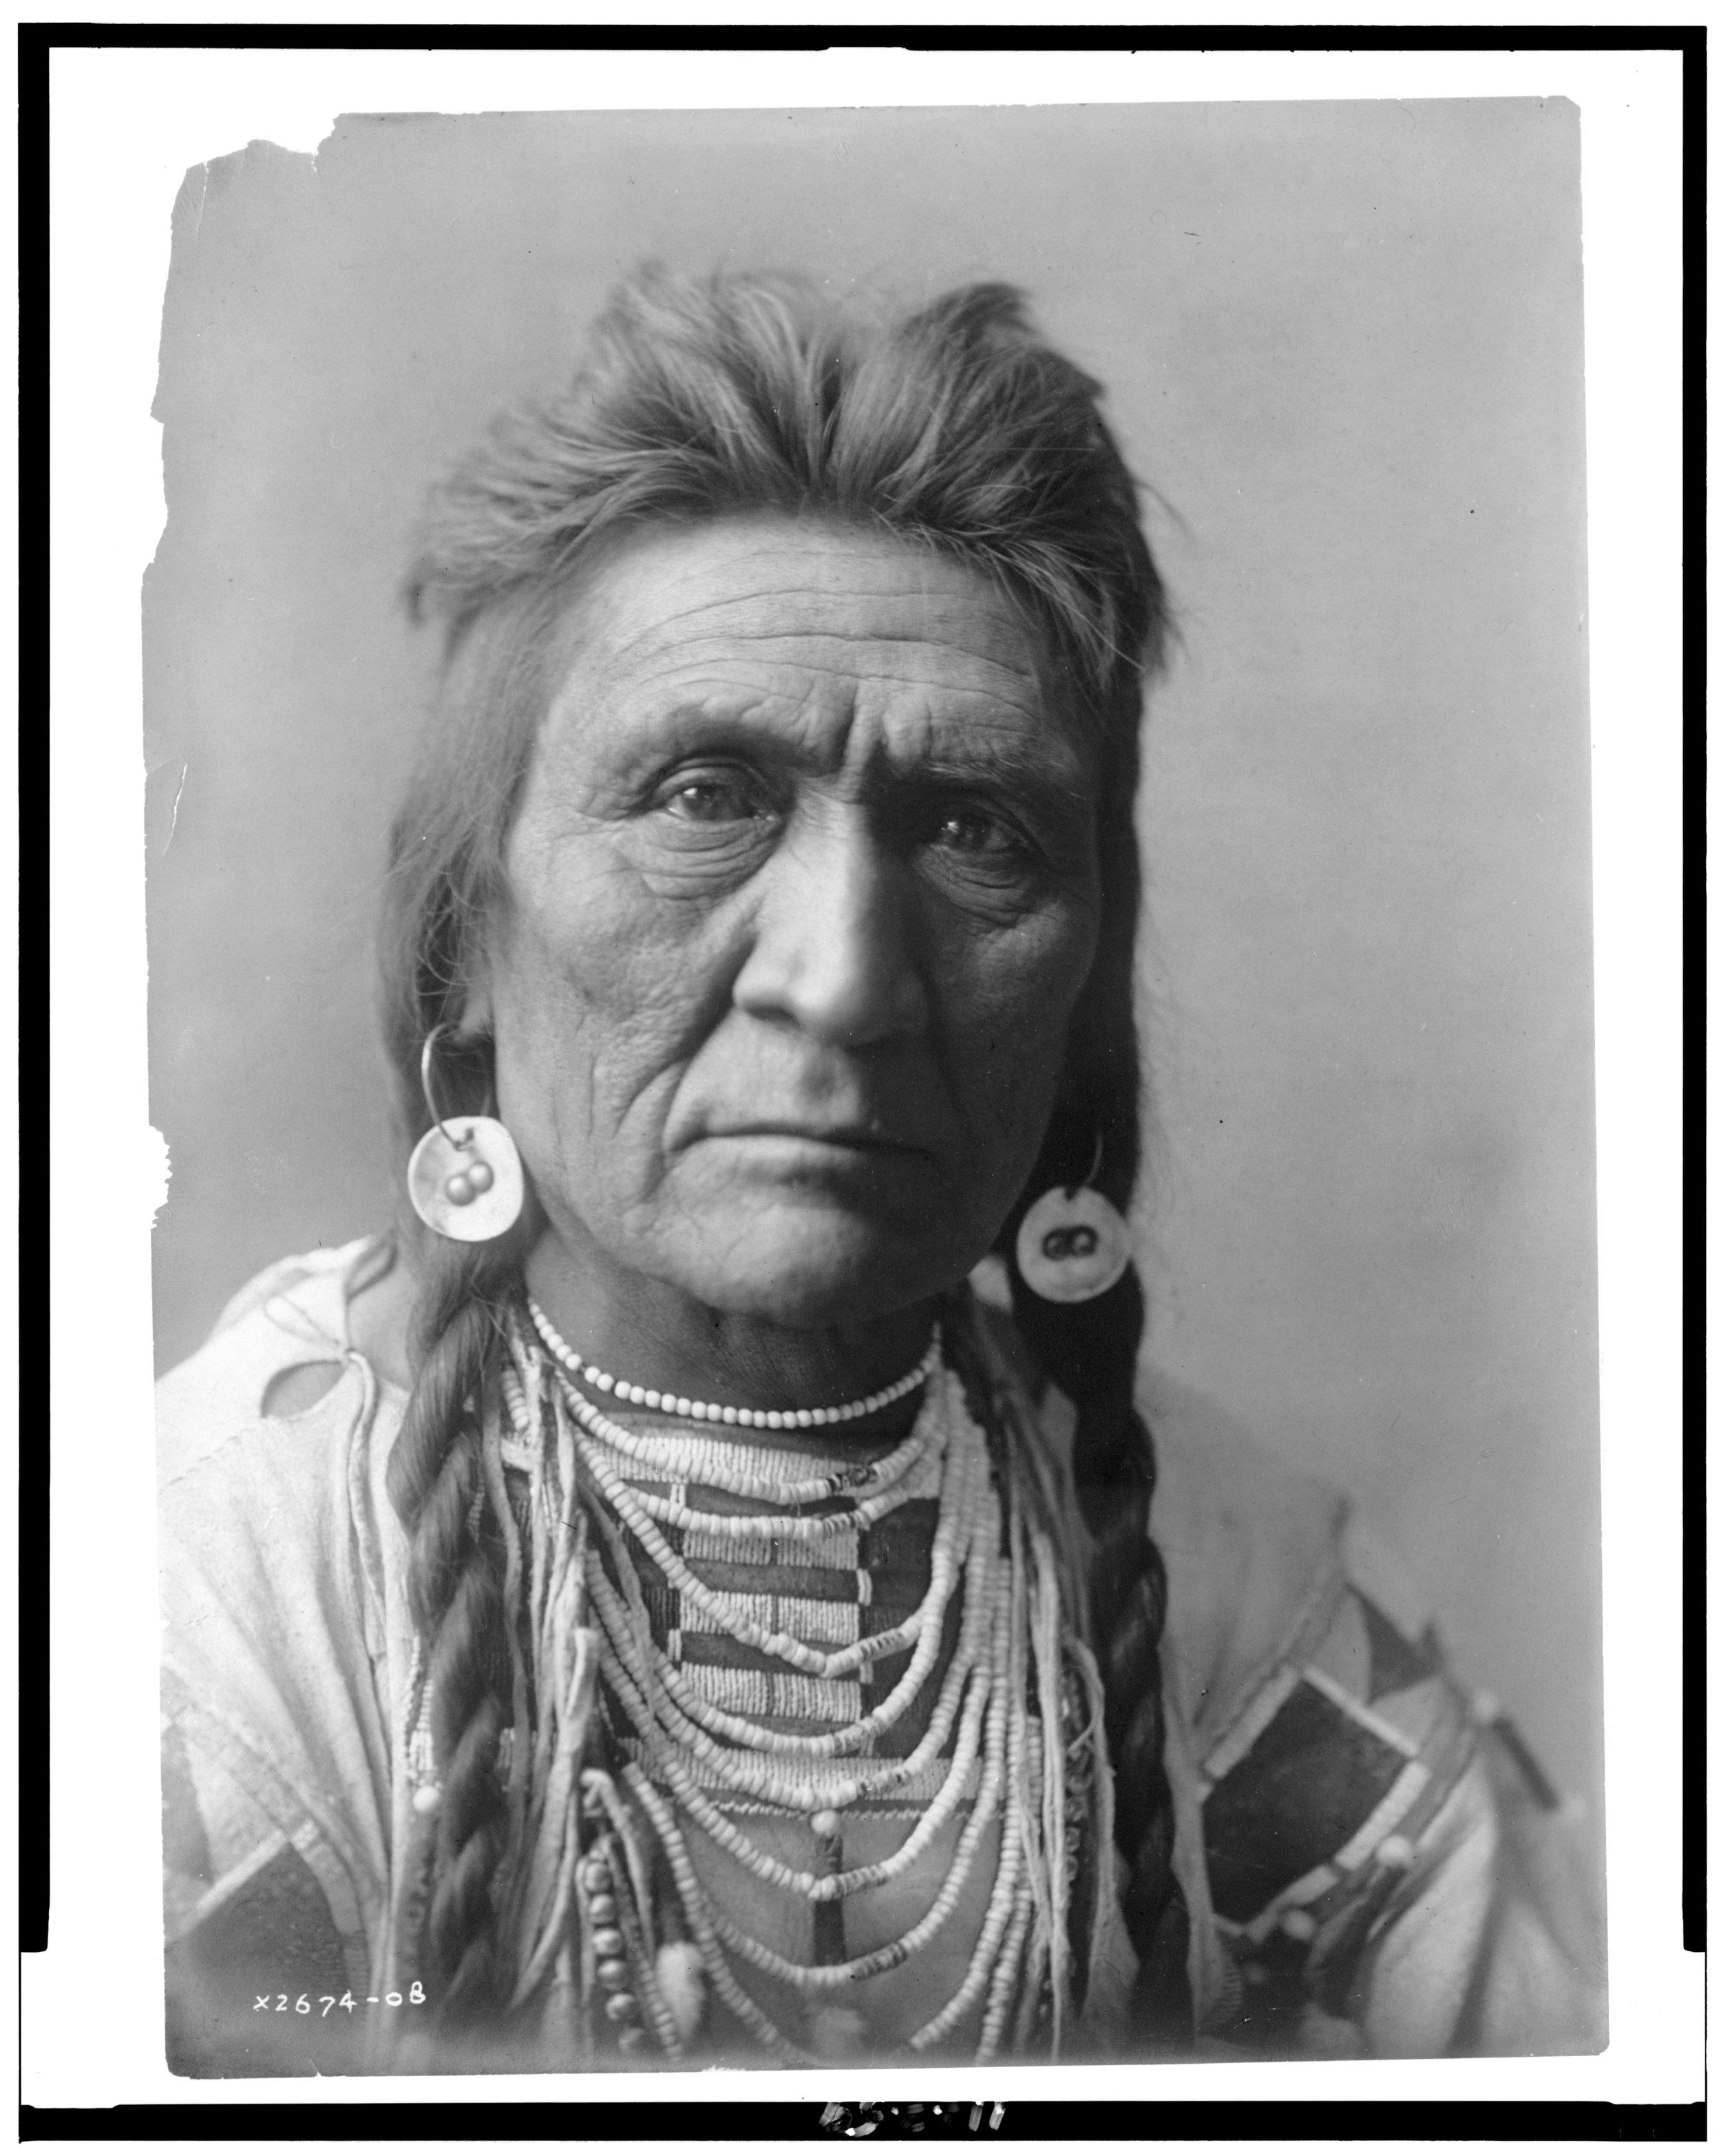 Absaroke (Crow) Chief